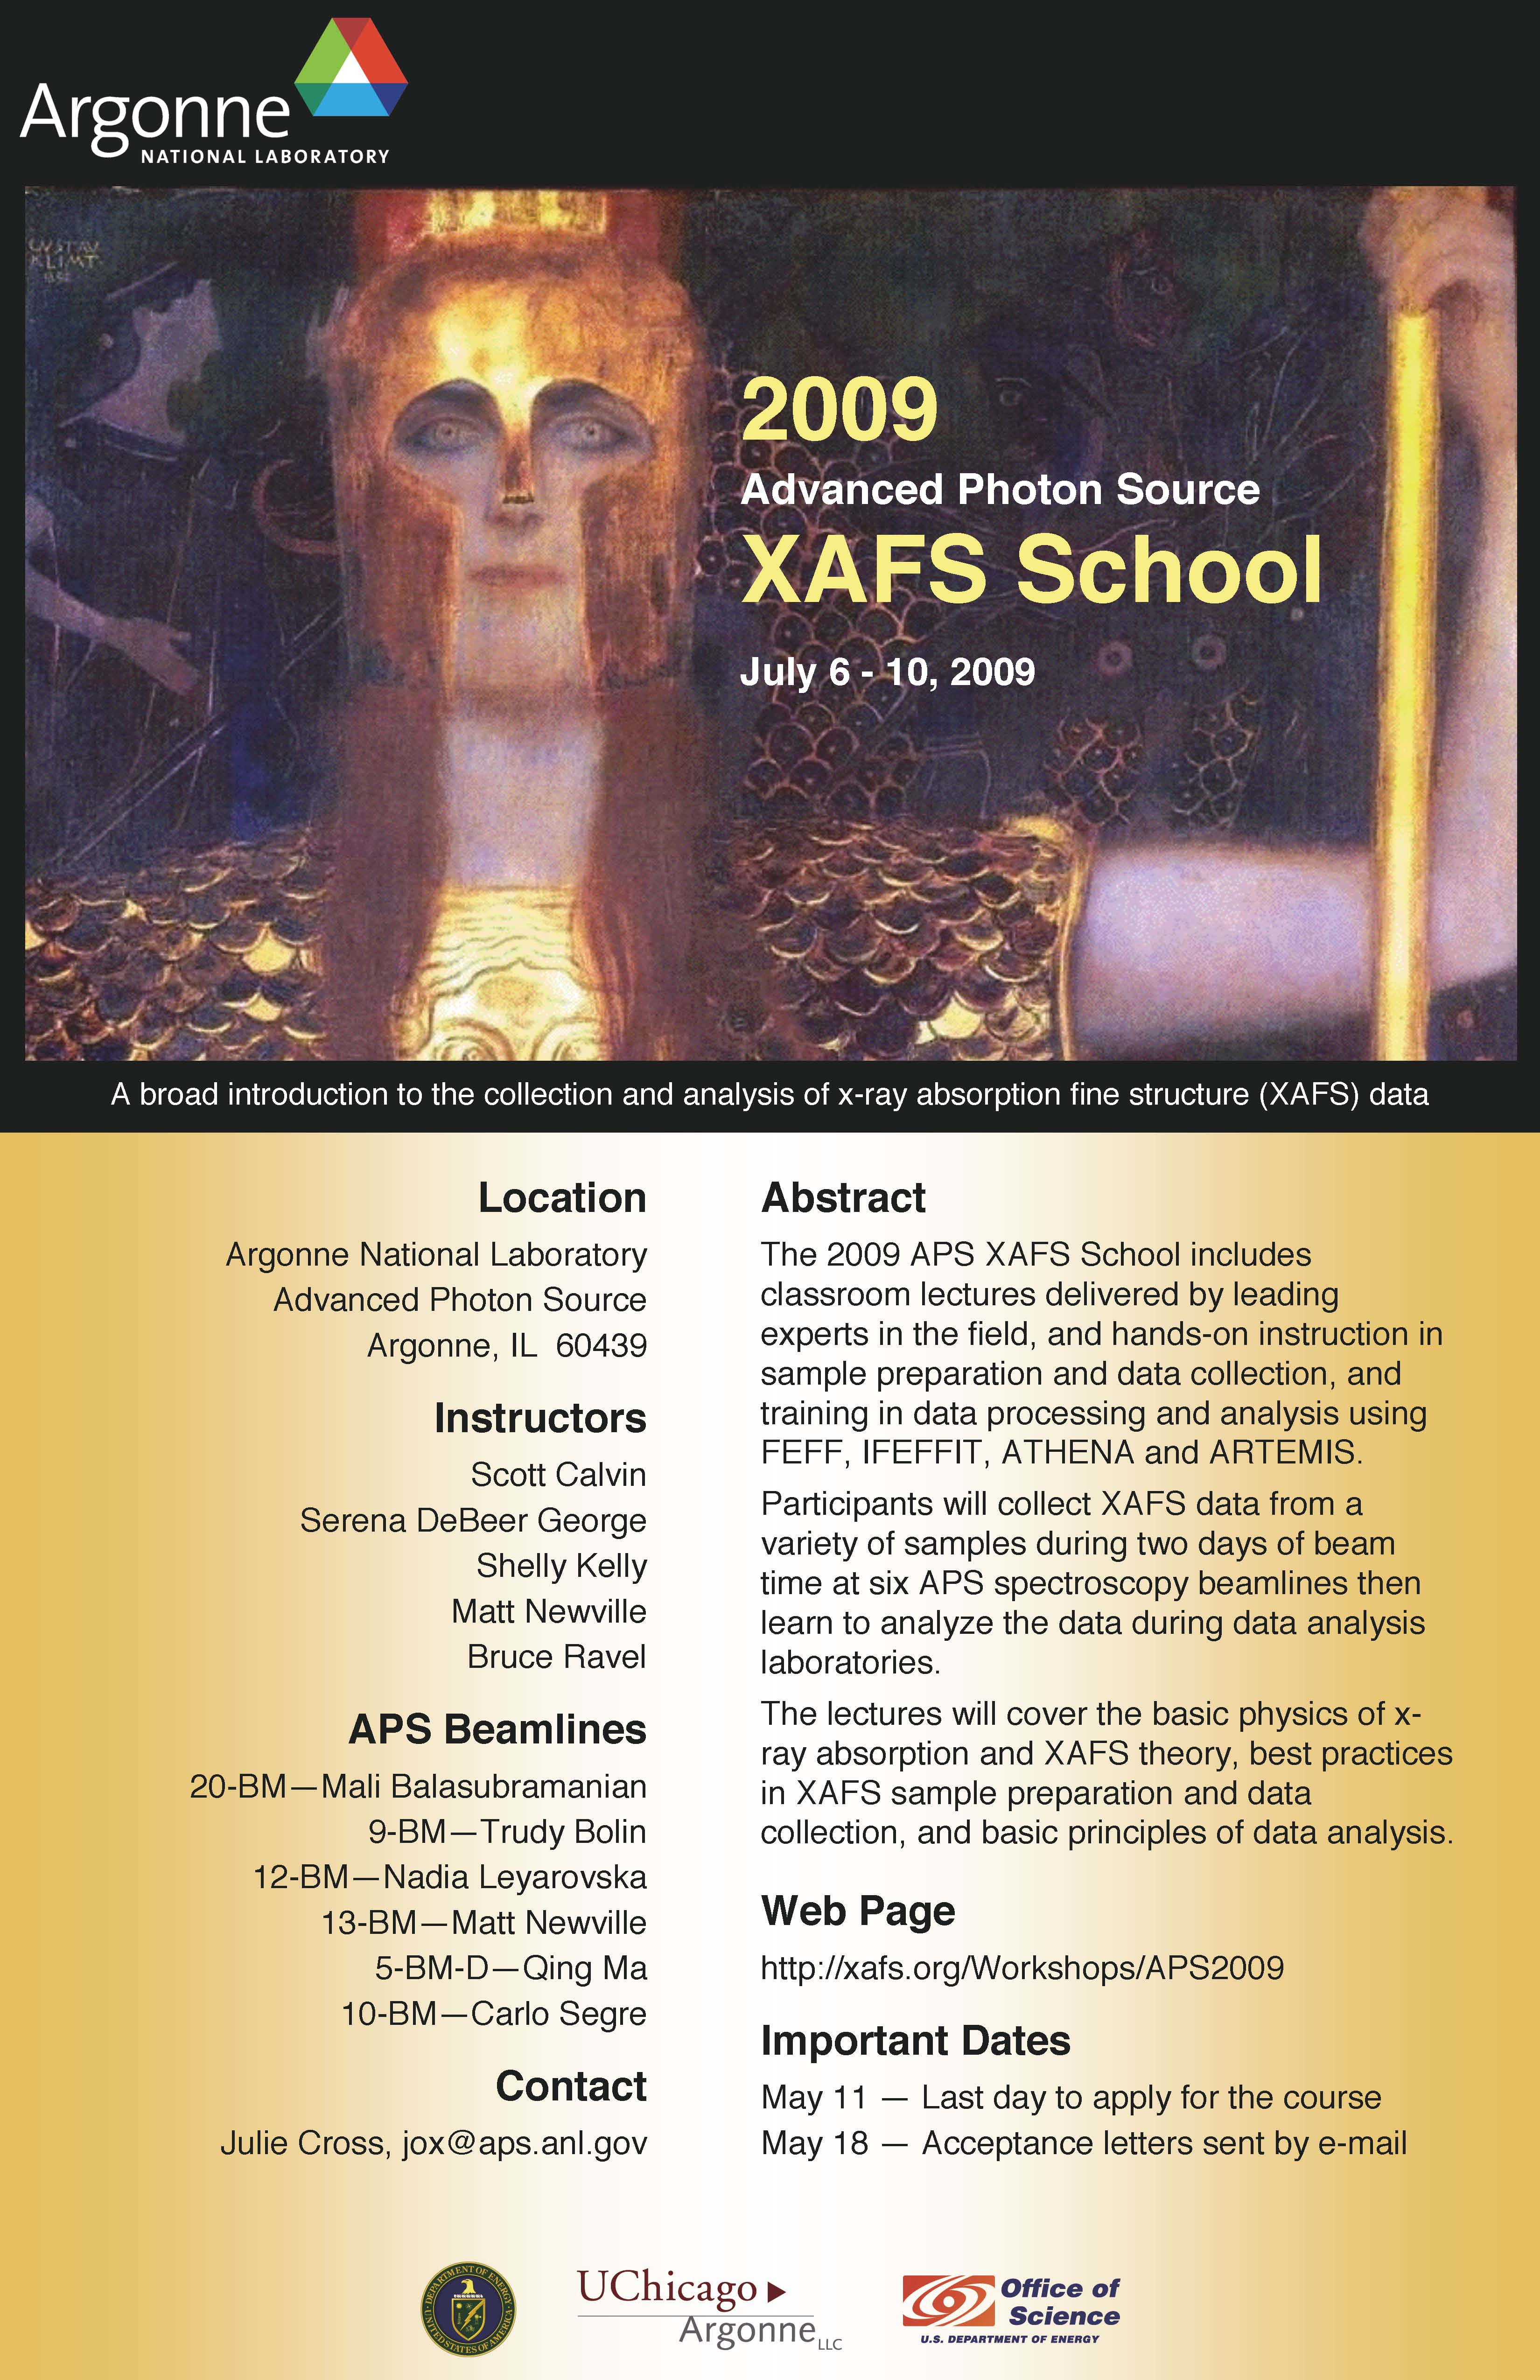 https://docs.xrayabsorption.org/Workshops/APS2009/apsxafs09poster.jpg